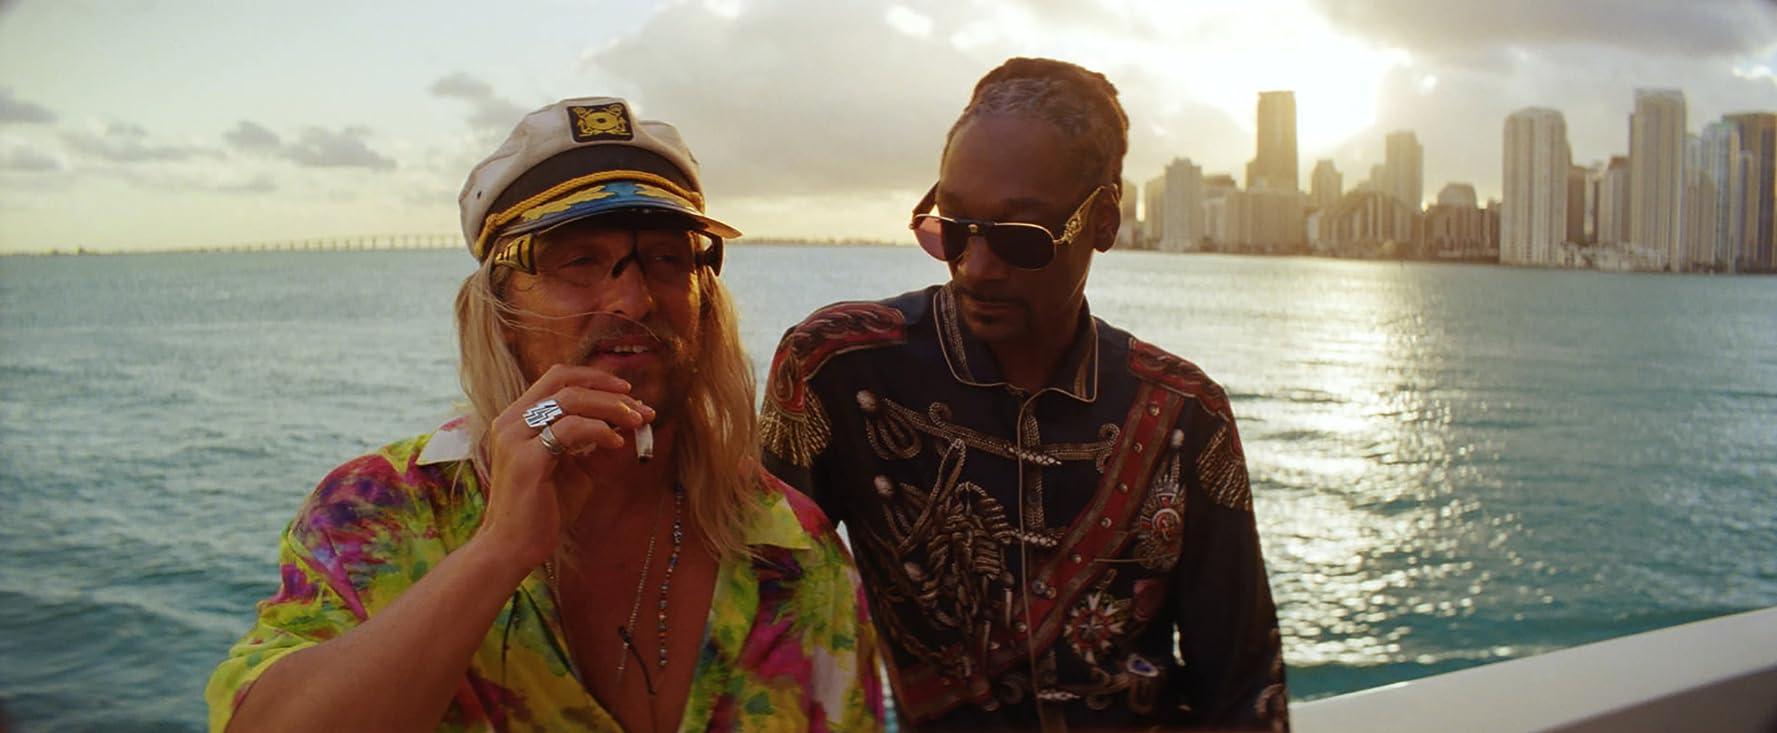 Matthew McConaughey and Snoop Dogg in The Beach Bum (2019)